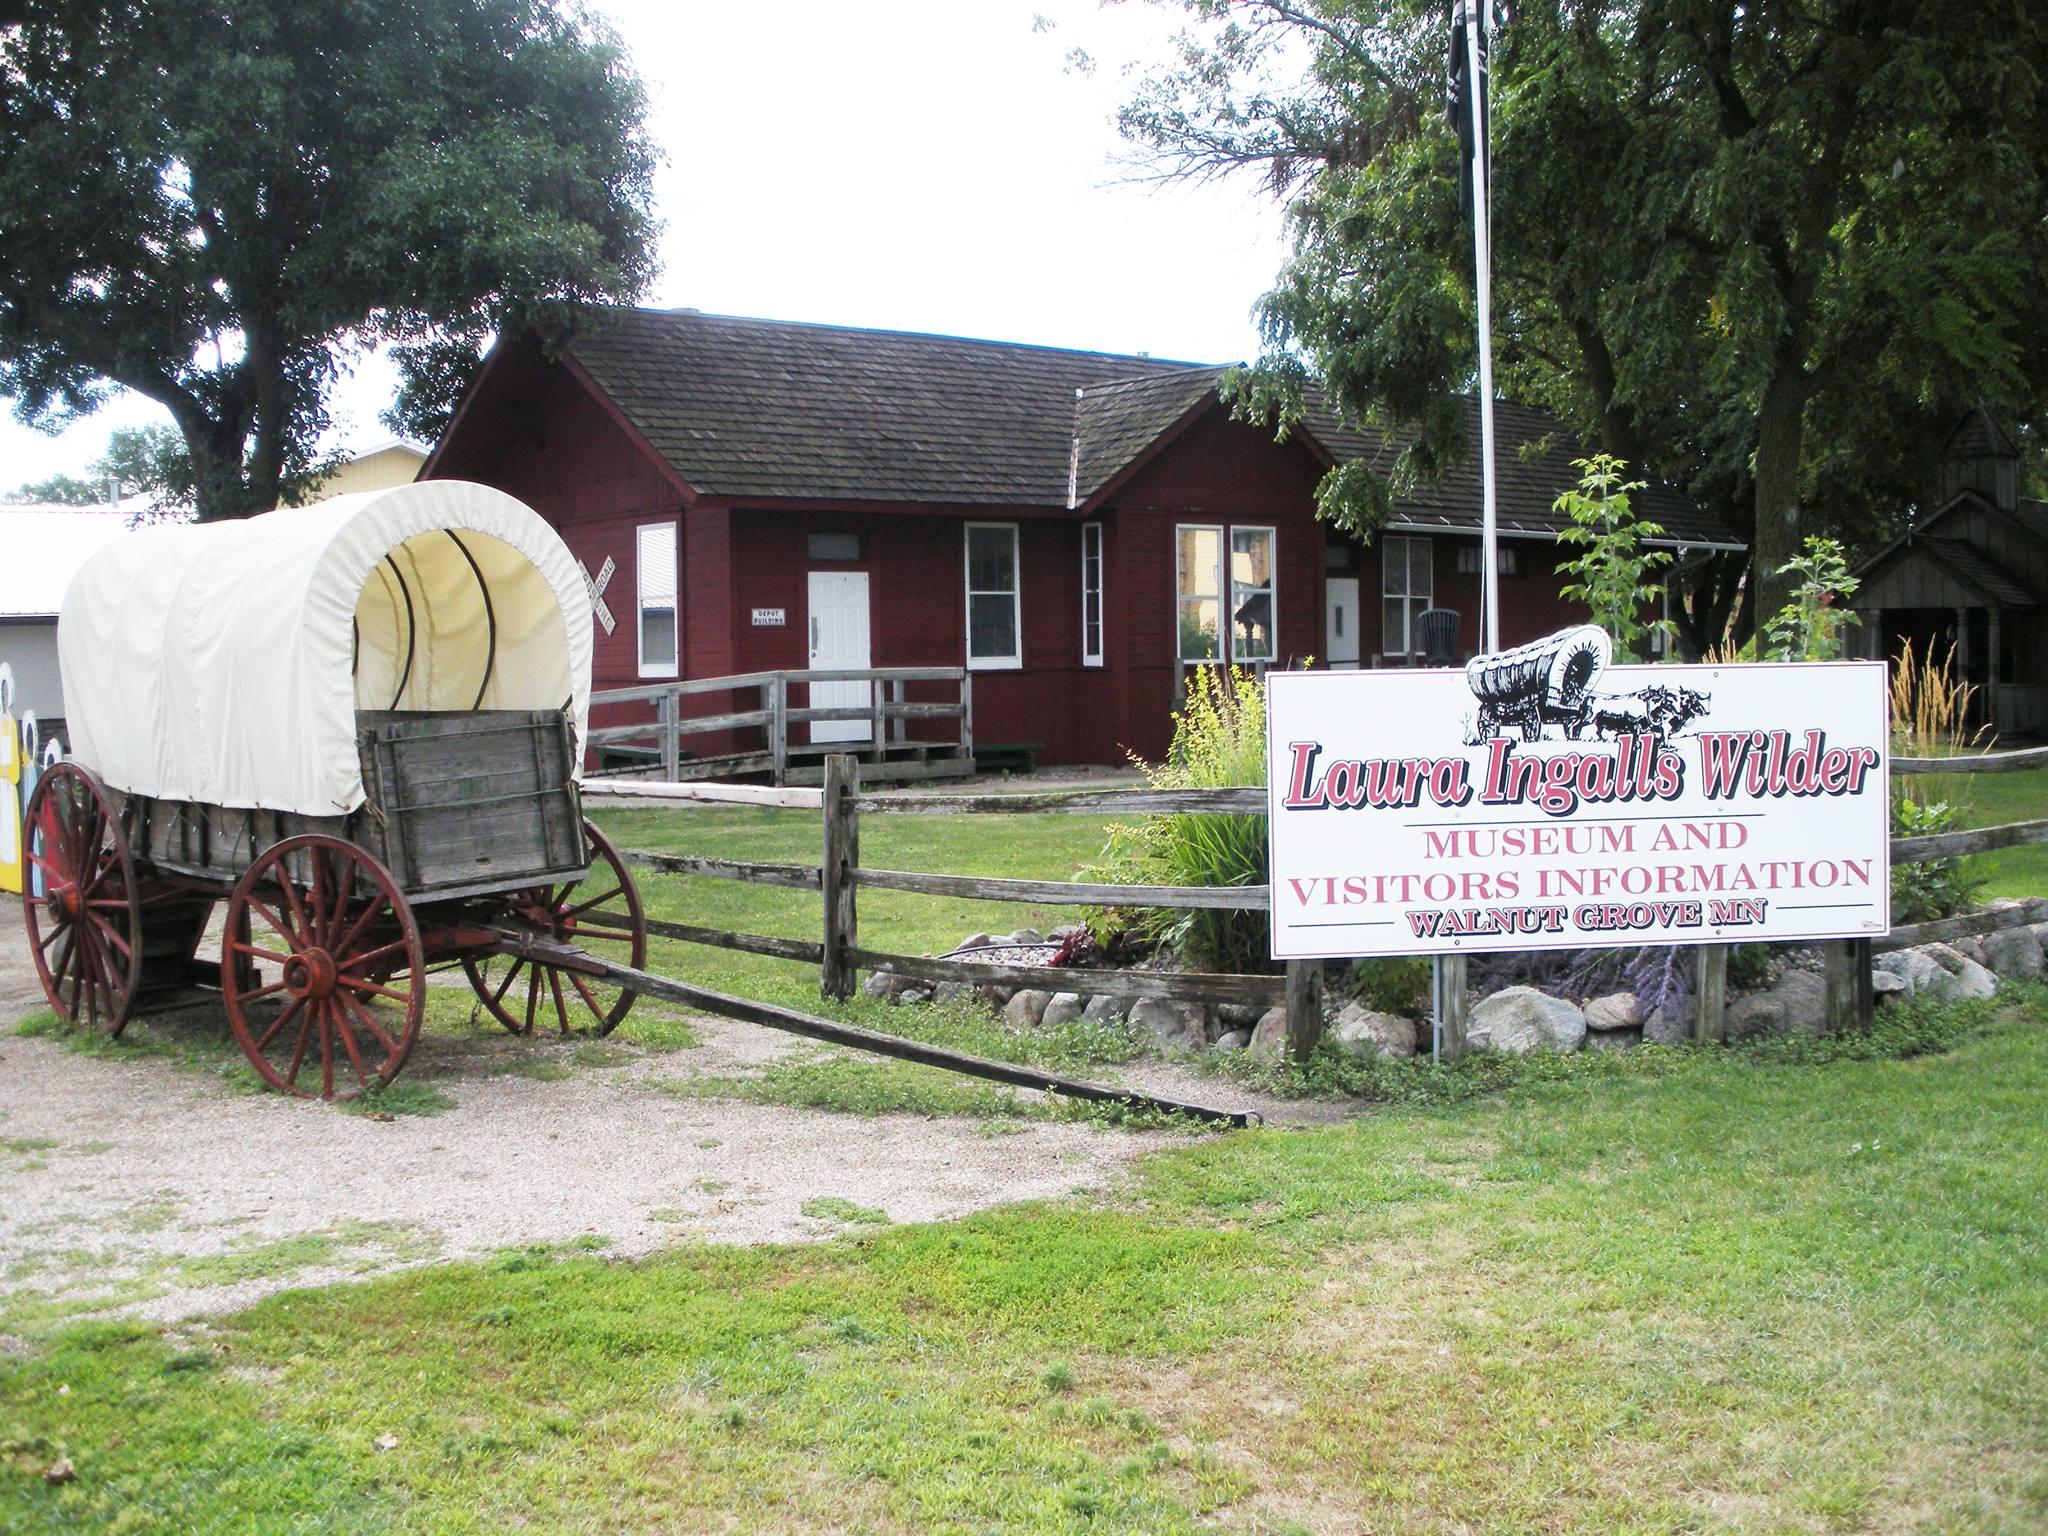 Little House on the Prairie Cast Reunion in Walnut Grove - Thrifty